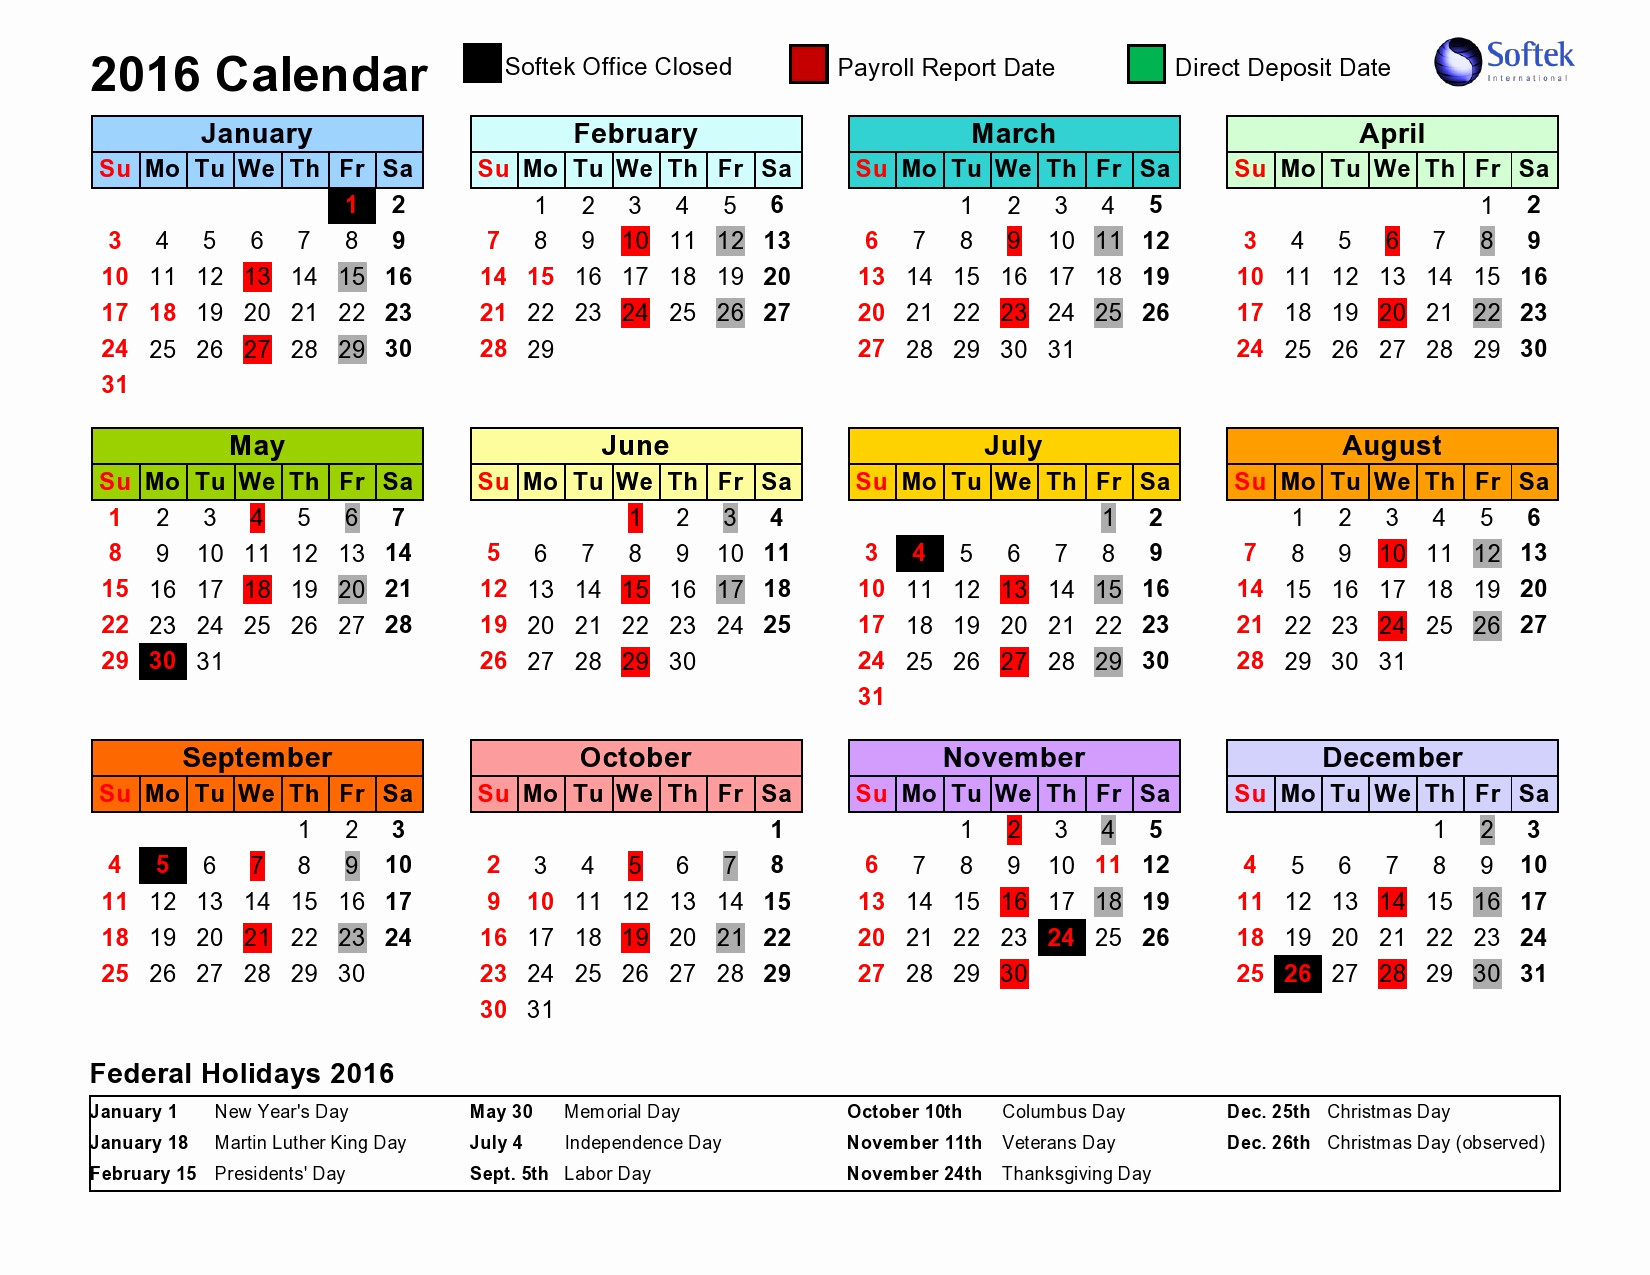 2017 Biweekly Payroll Calendar Template Biweekly Payroll Calendar with regard to Biweekly Payroll Calendar Template